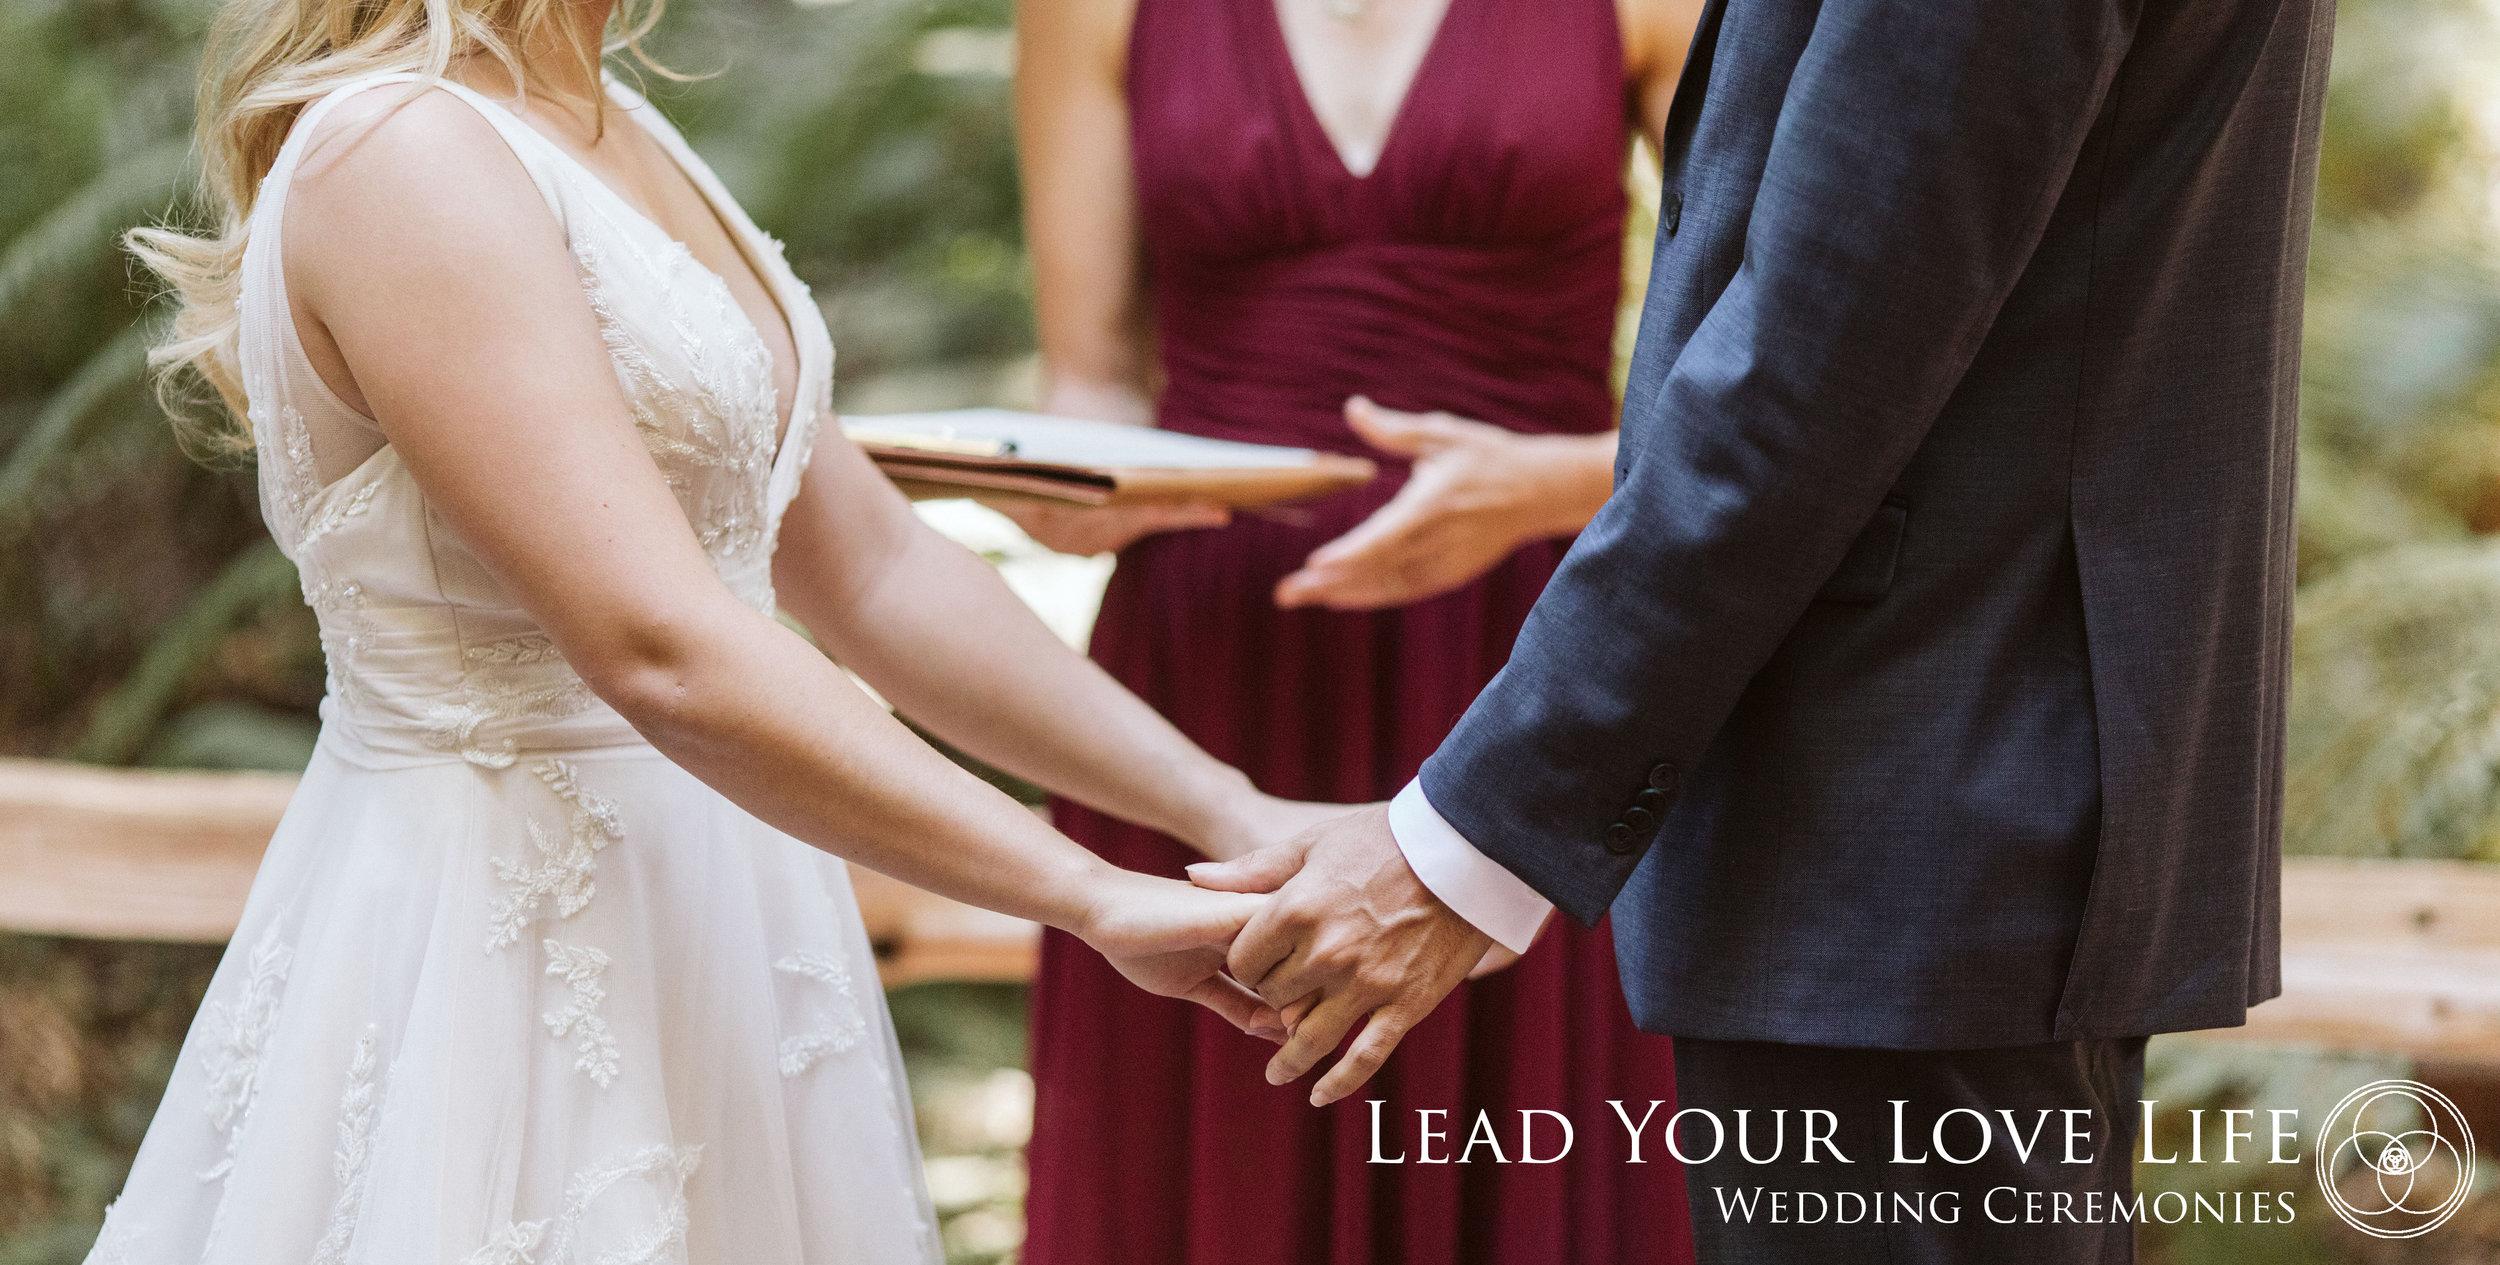 Sarah Oswald, Lead Your Love Life, FAQ